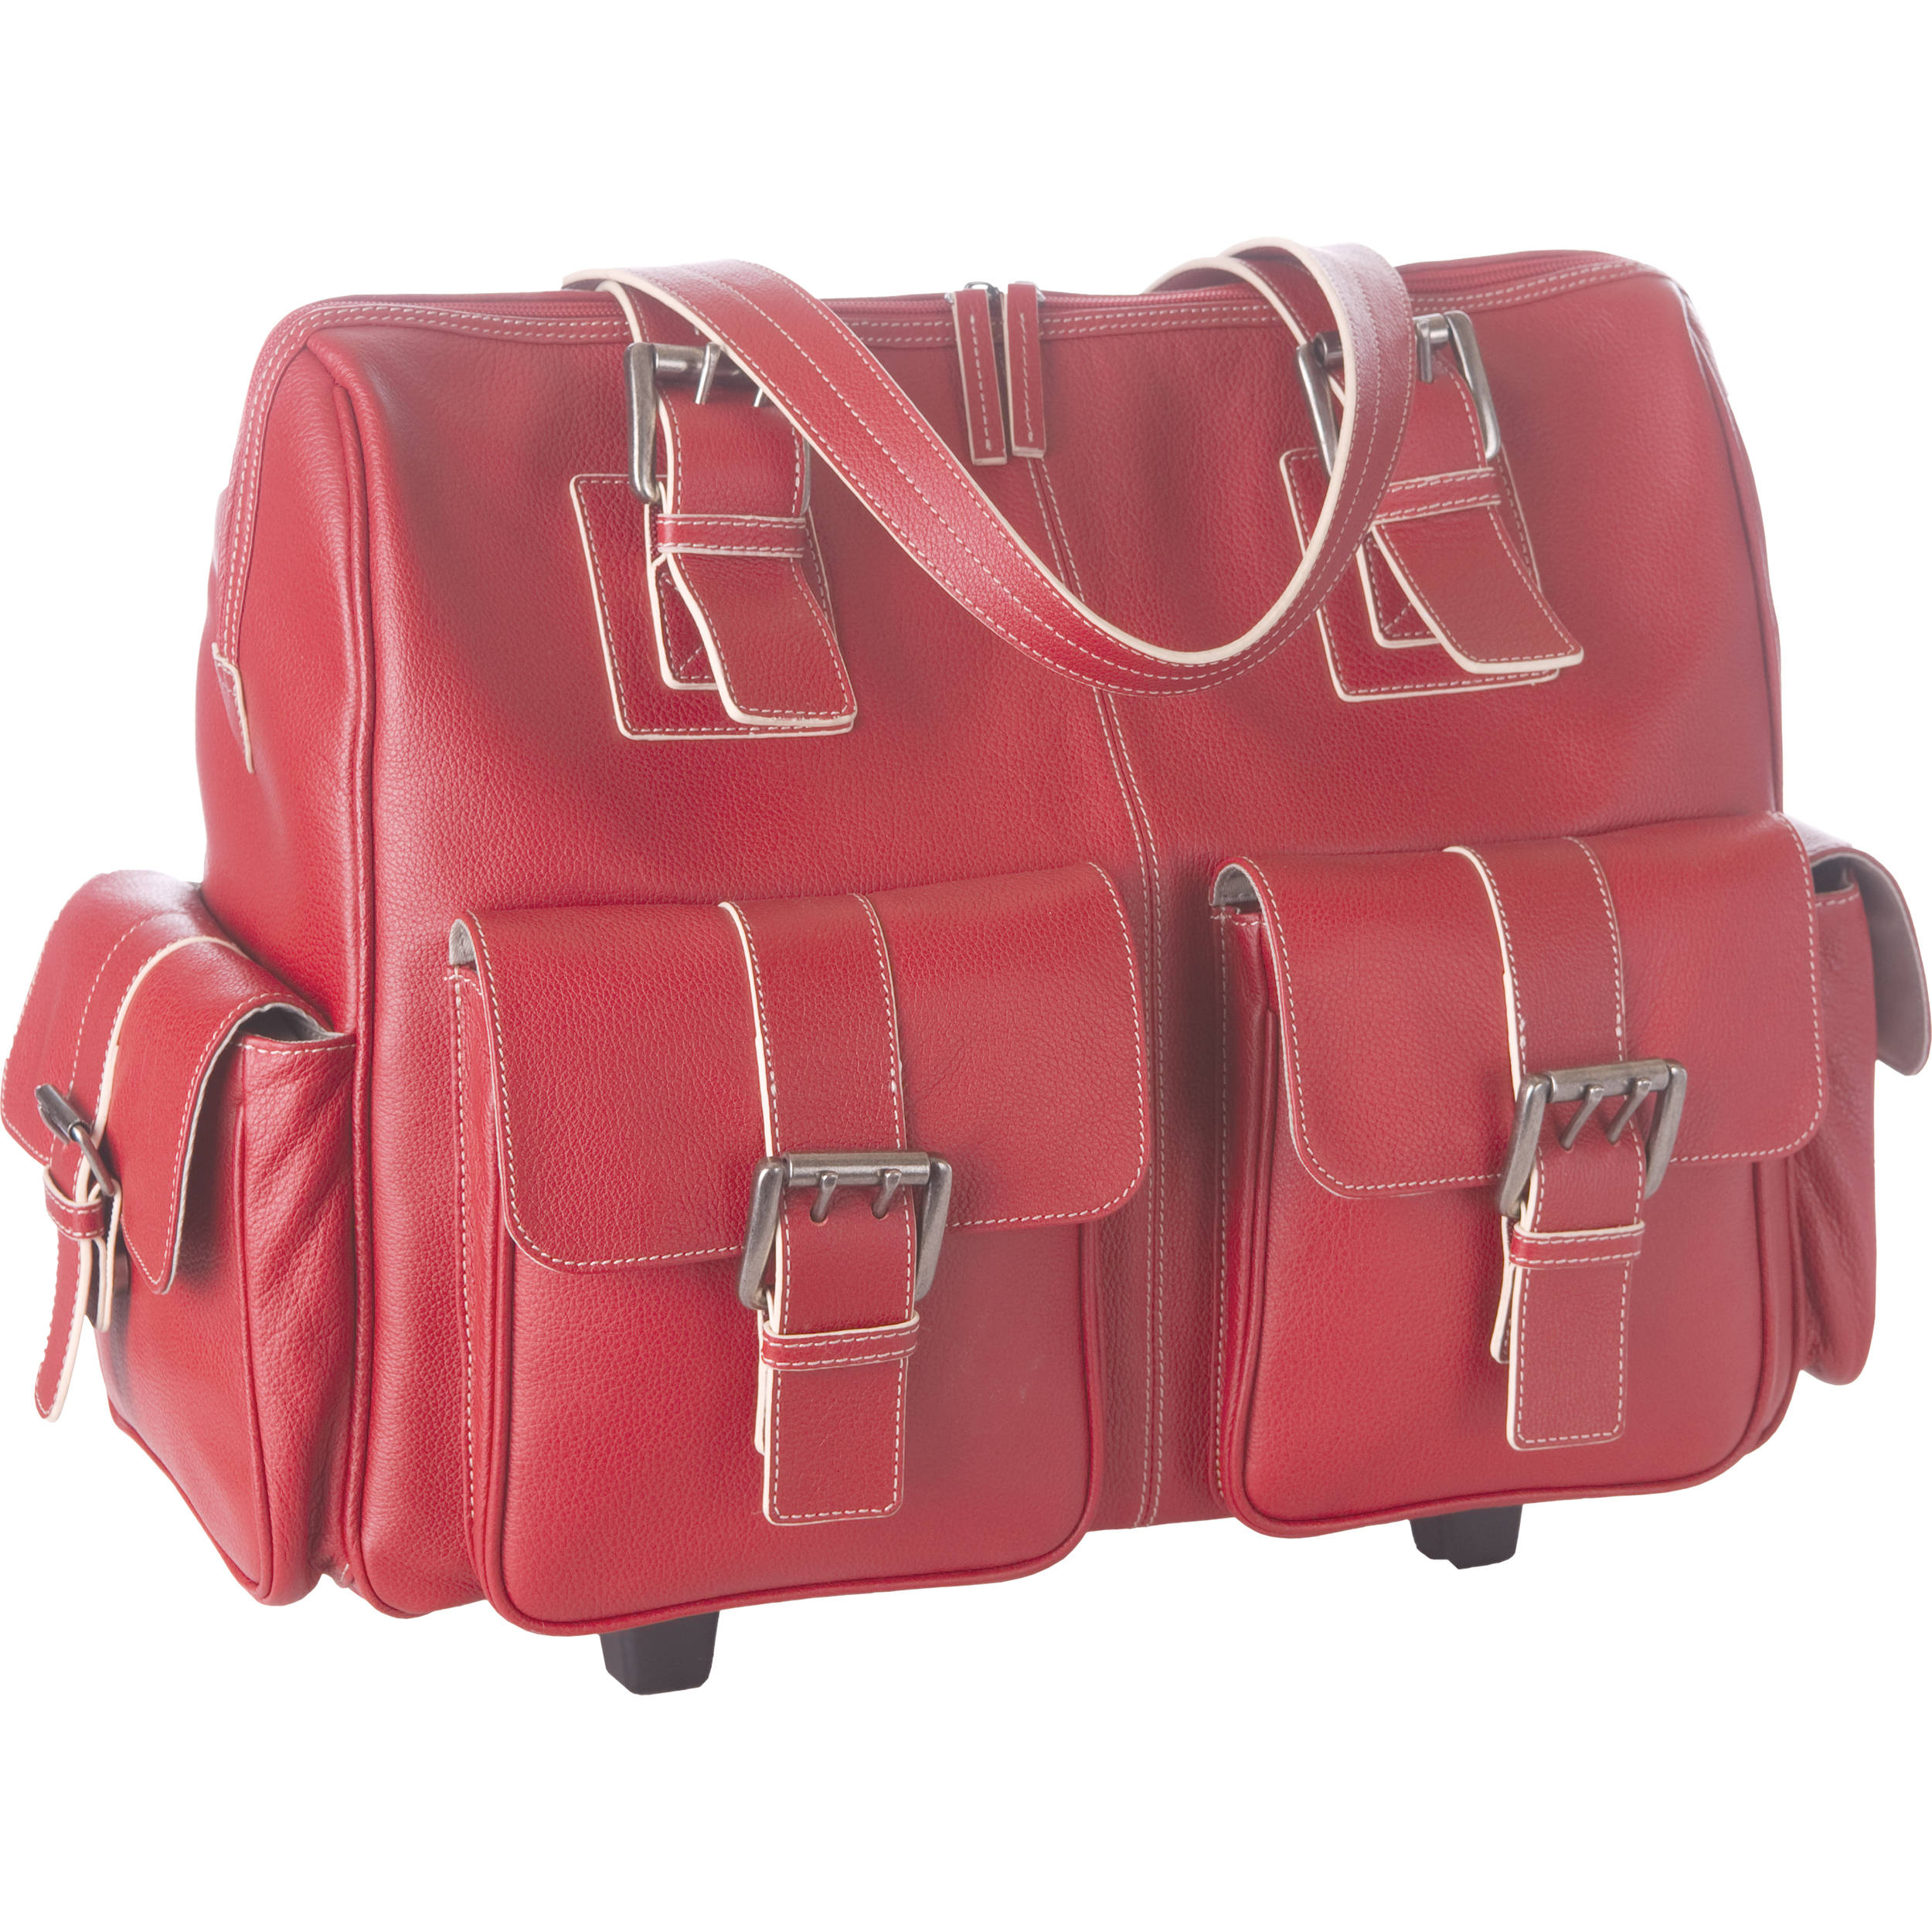 Jill E Designs Large Rolling Camera Bag Red